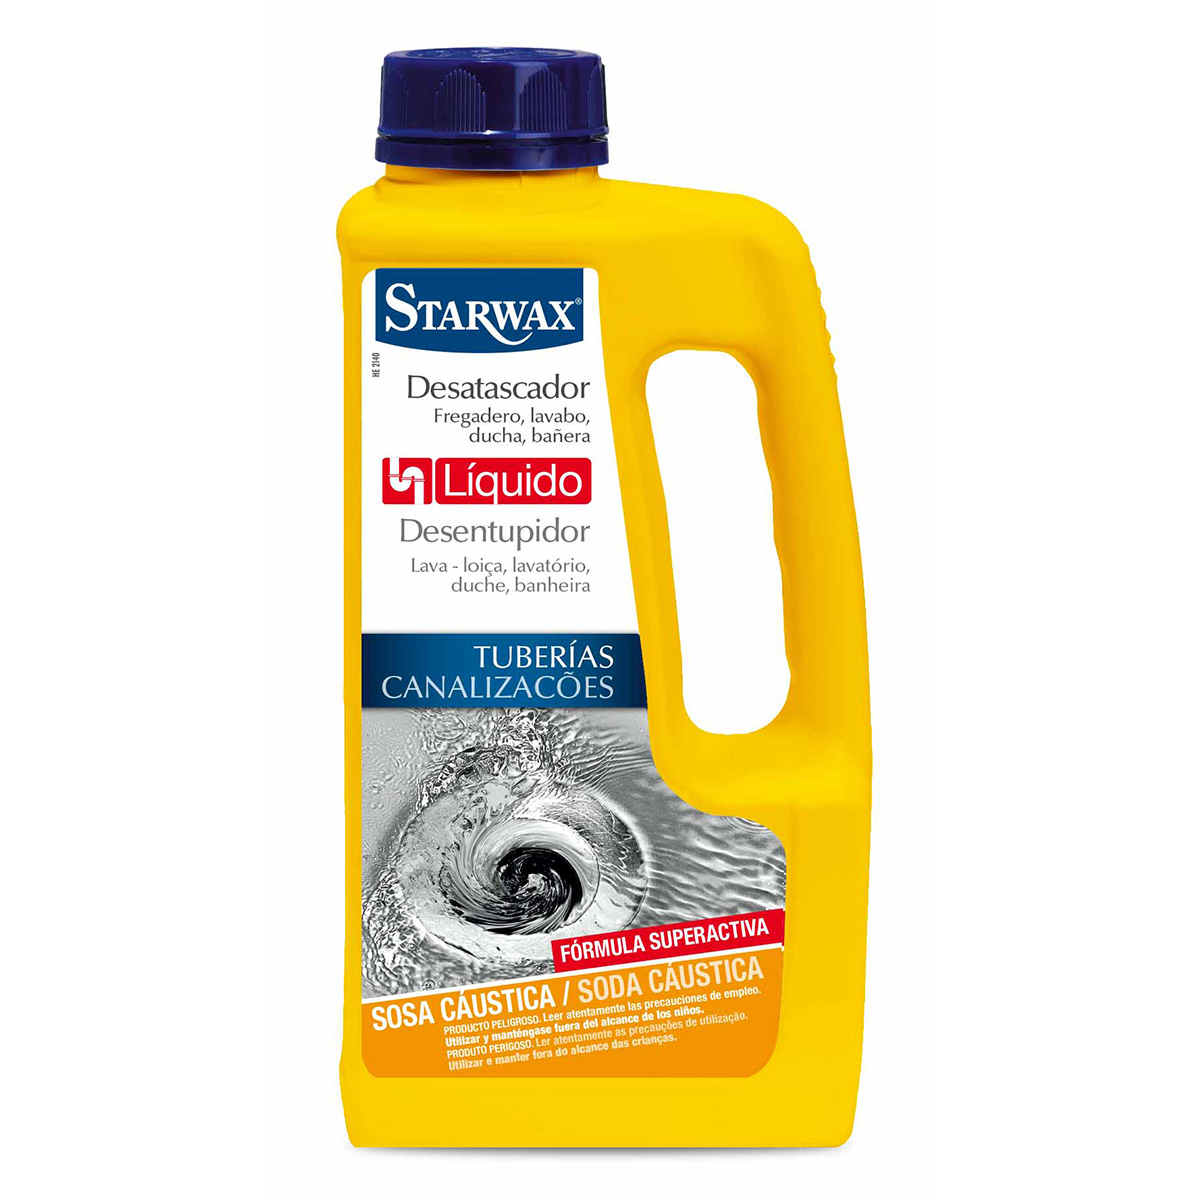 Desatascador liqu do starwax limpieza de la casa - Liquidos para desatascar tuberias ...